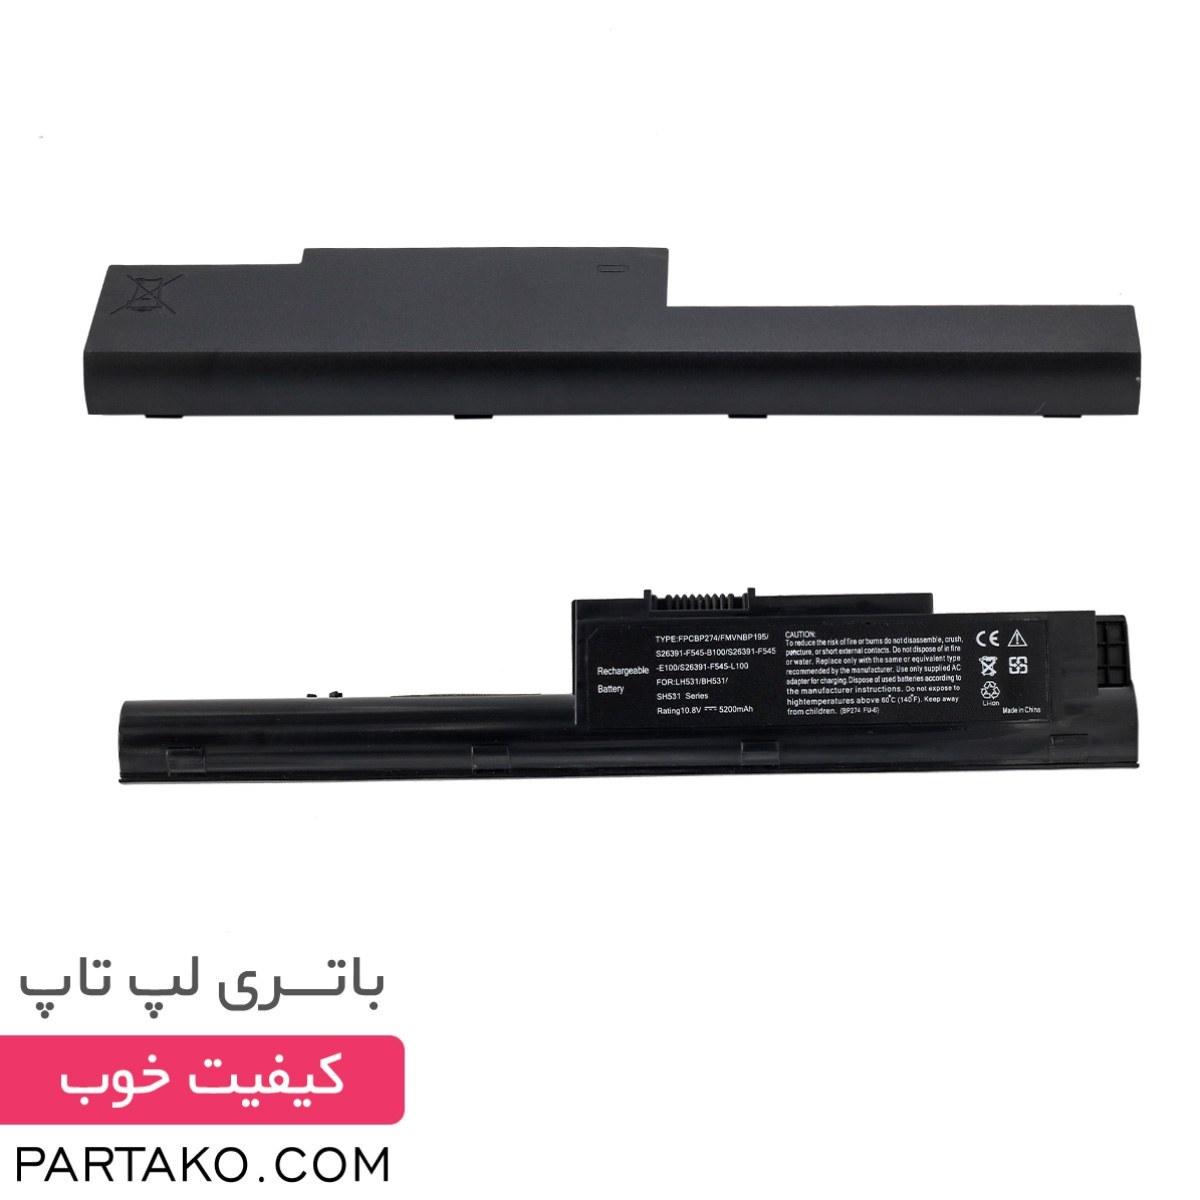 باتری لپ تاپ فوجیتسو Laptop Battery Fujitsu LifeBook LH531